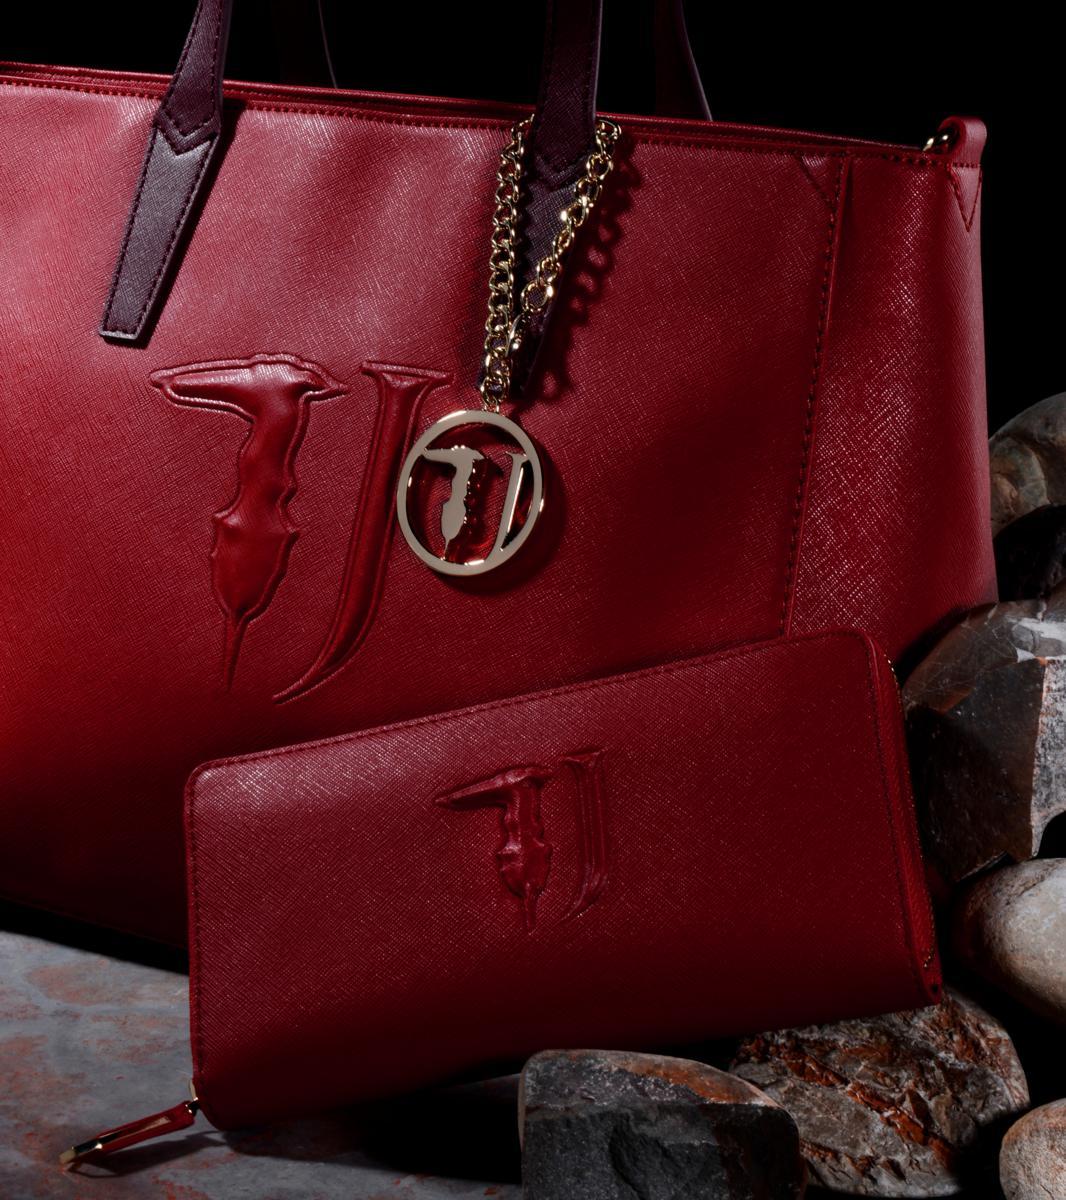 c5f4887843 Trussardi Jeans Bags Online Shop | The Art of Mike Mignola